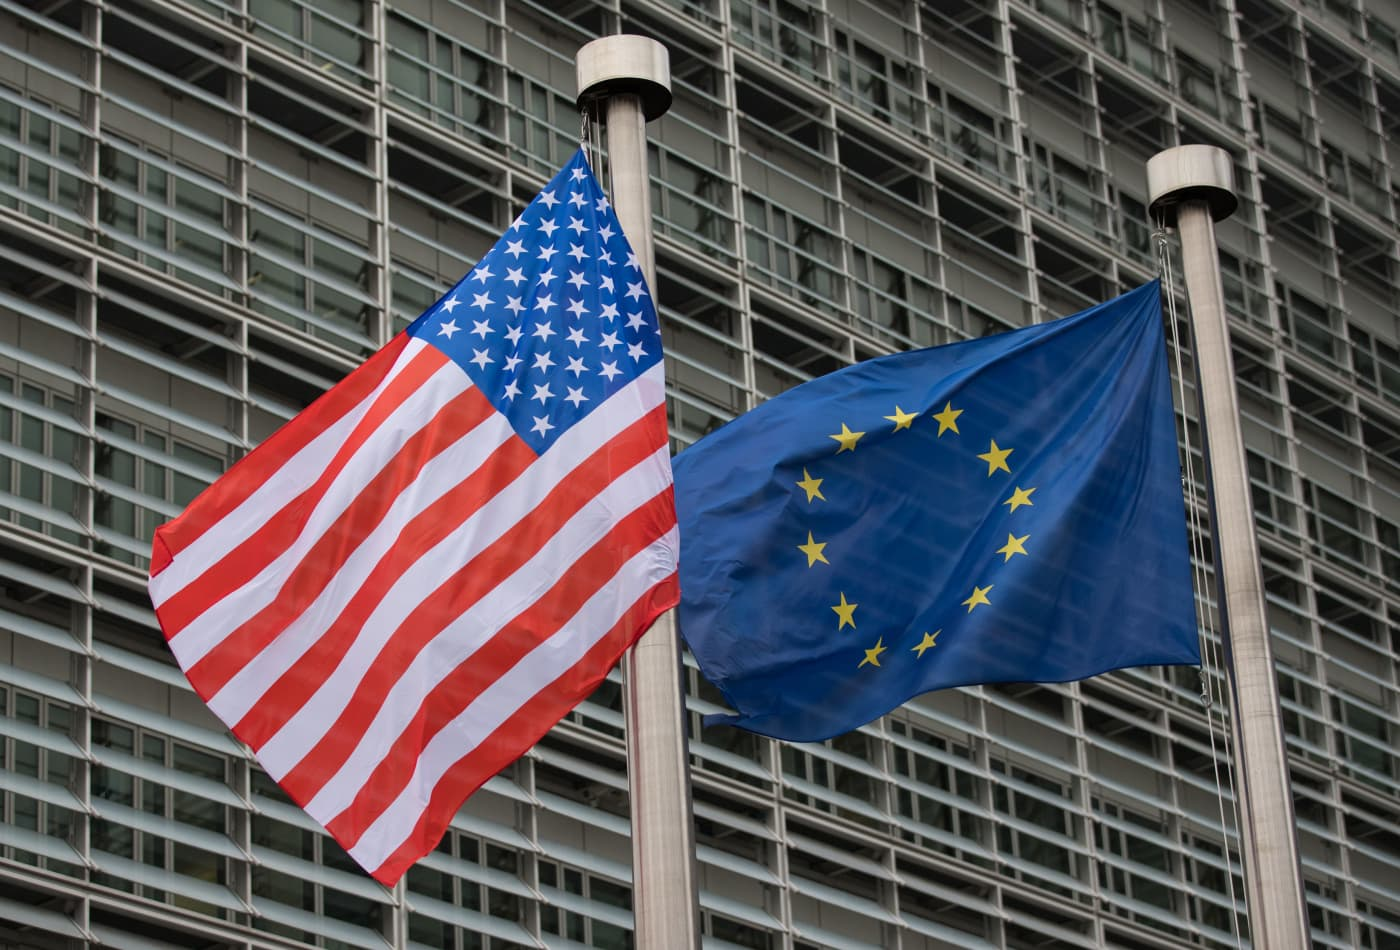 Op-ed: The U.S. and EU have a lot of work to do to rebuild their trade relationship